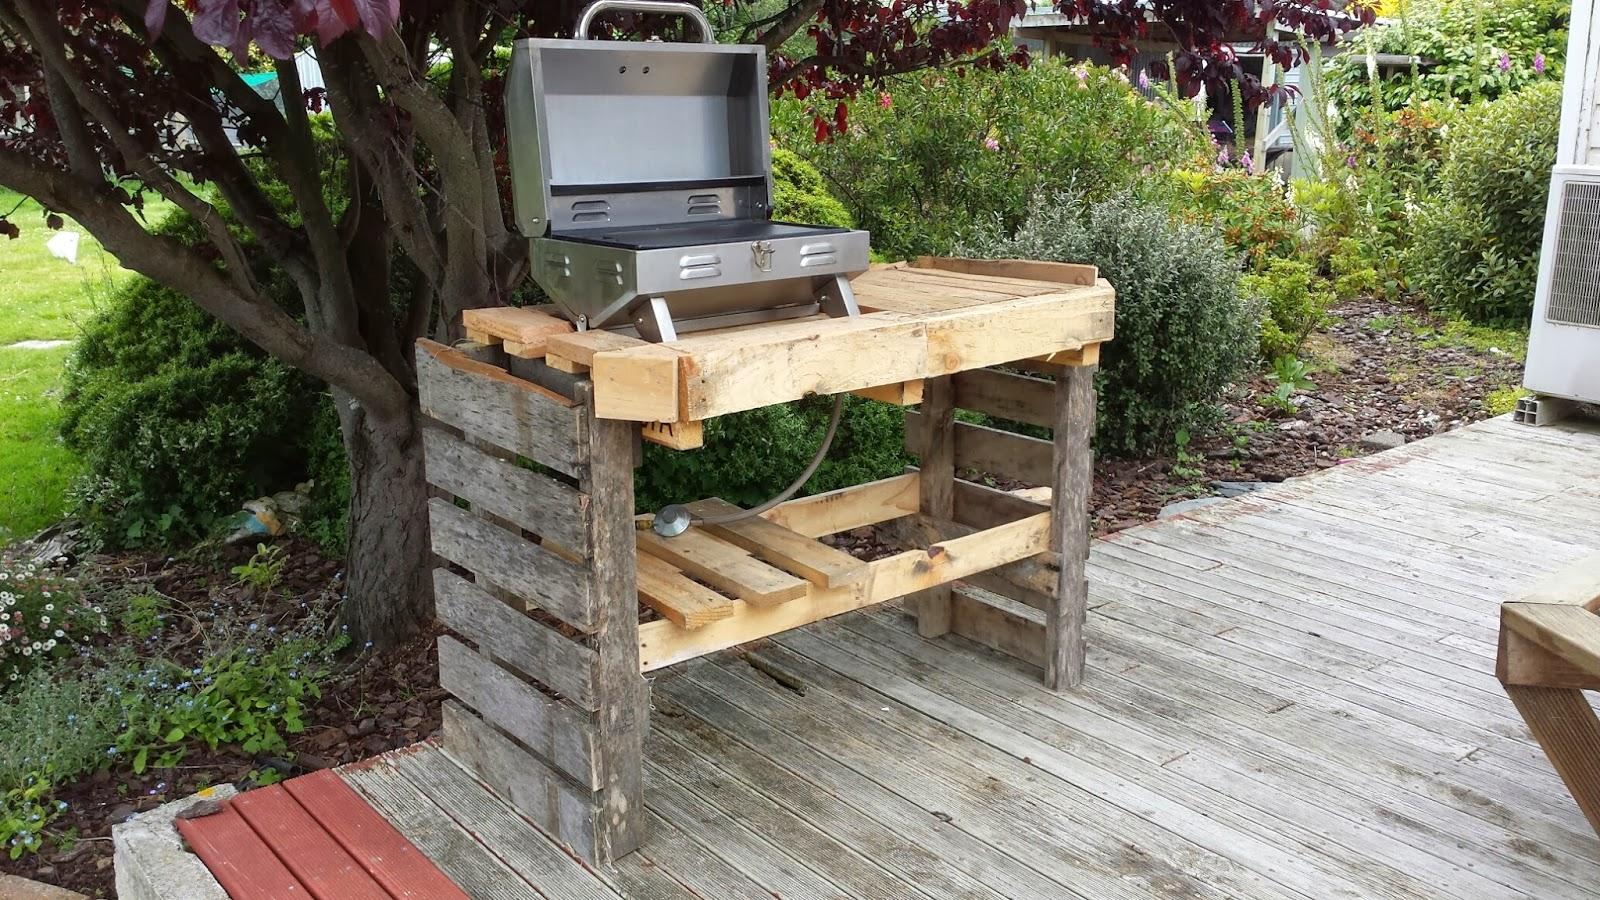 Outdoor Küche Selbst Gemacht : Outdoor küche bauen anleitung küchen selber bauen ideen outdoor